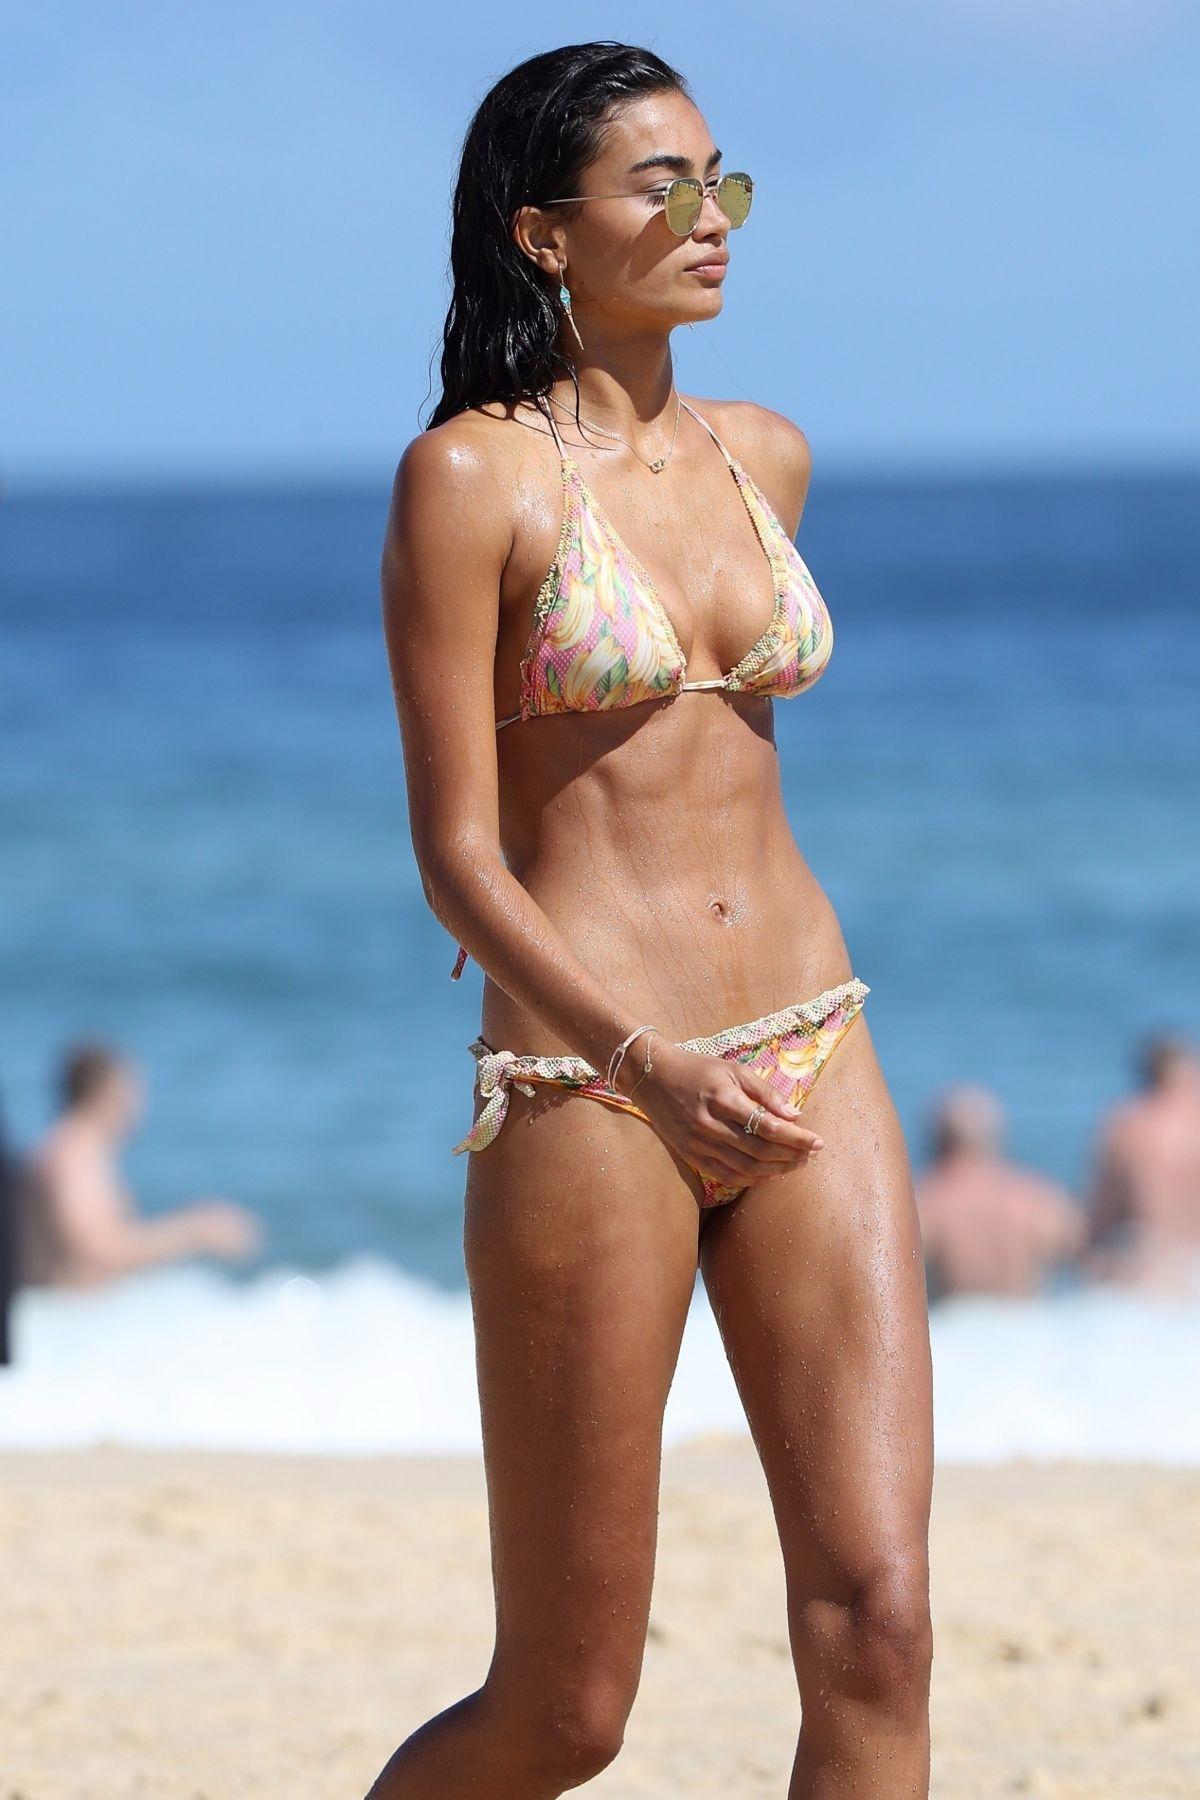 Kelly Gale in Bikini on Bondi Beach in Sydney Pic 31 of 35